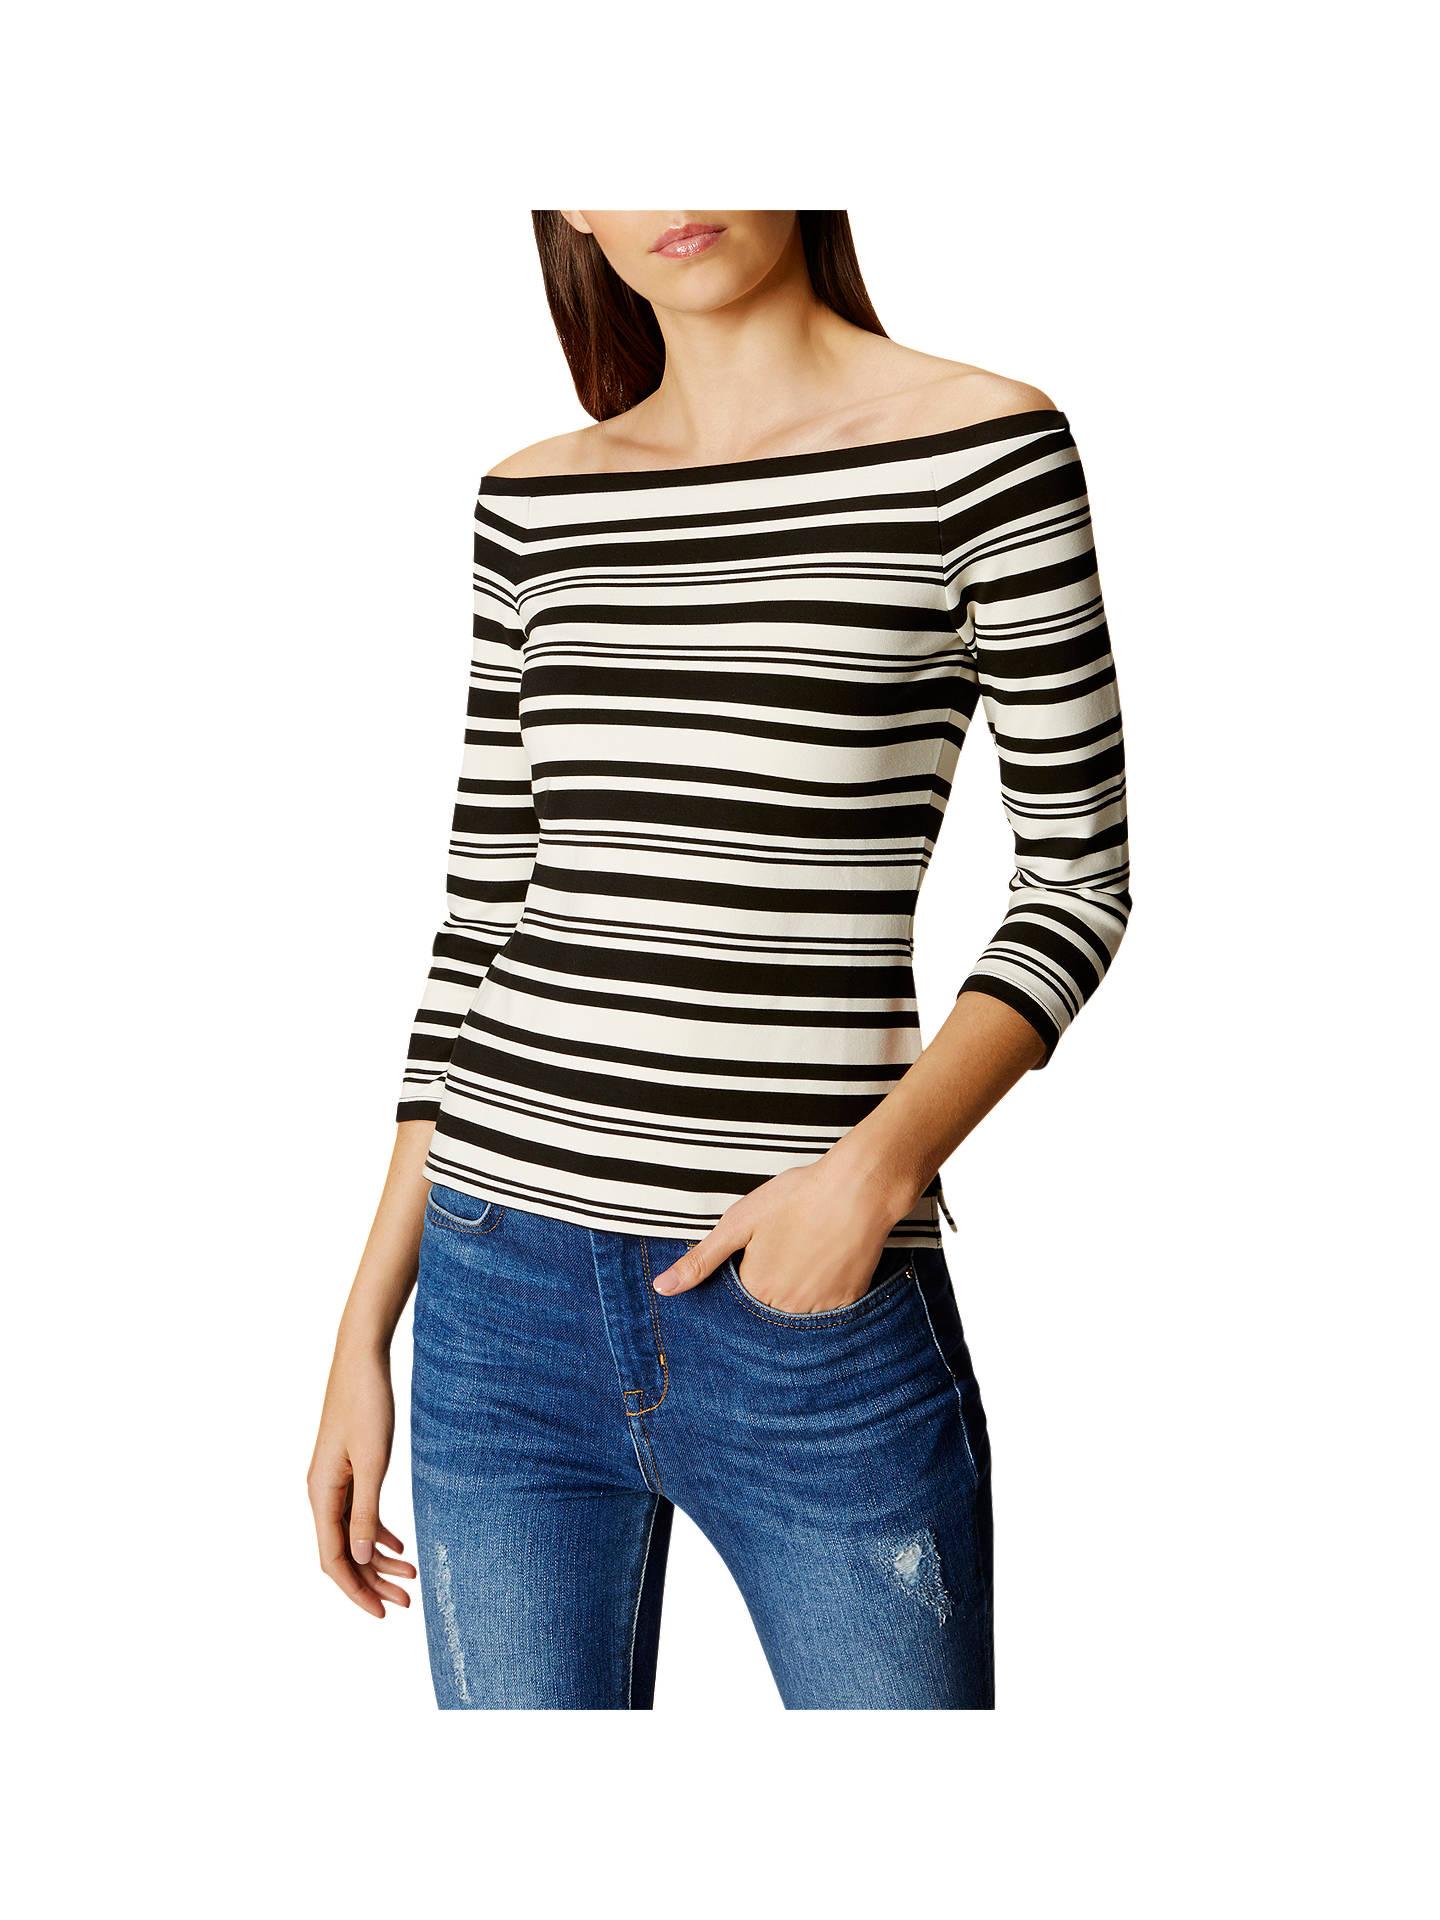 96833047828e98 BuyKaren Millen Bardot Shoulder Stripe Top